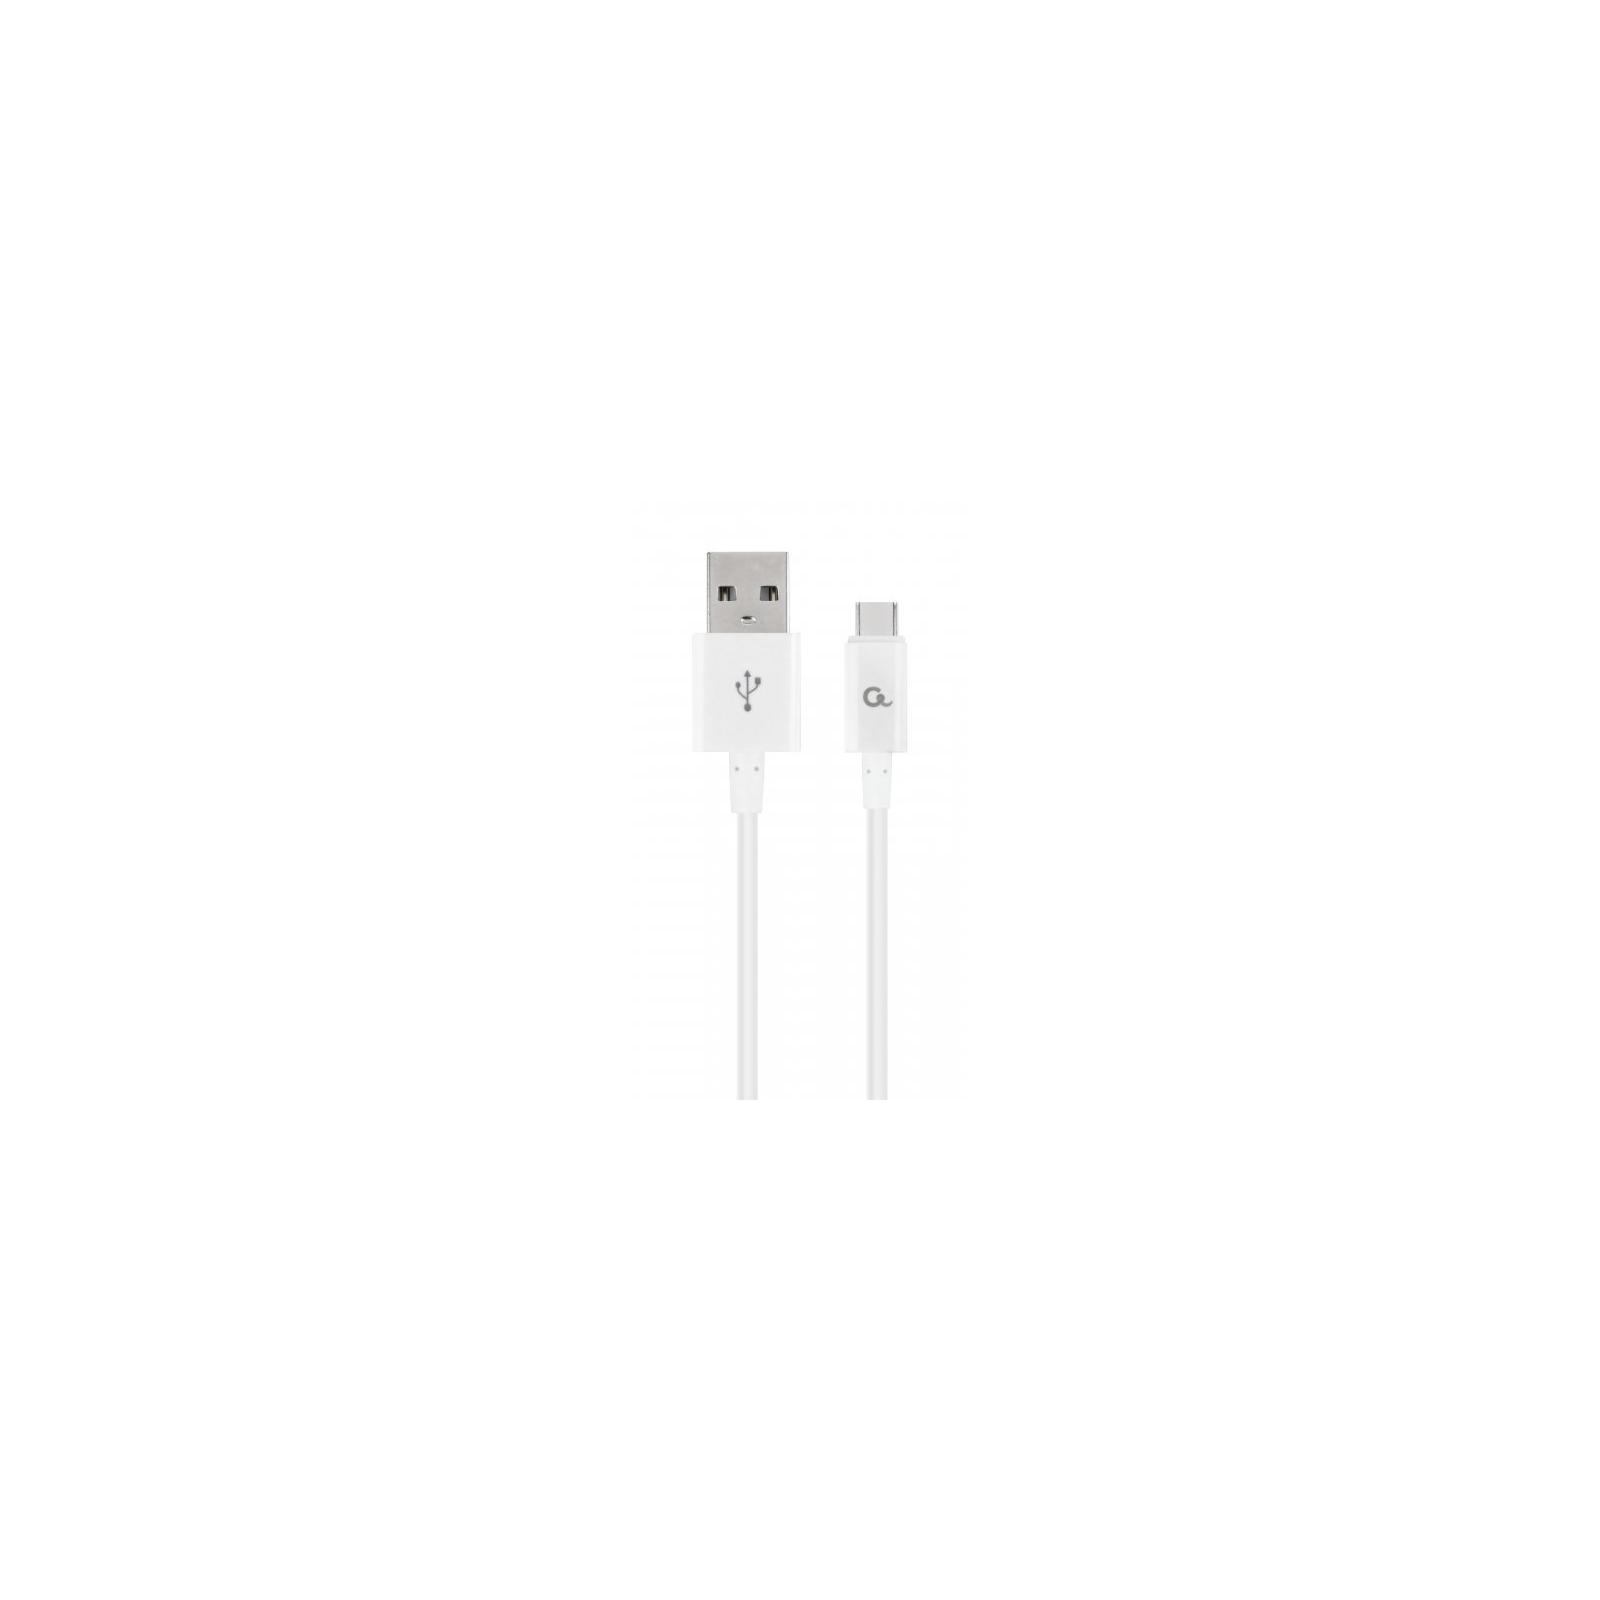 Дата кабель USB 2.0 AM to Type-C 1.0m Cablexpert (CC-USB2P-AMCM-1M-W)